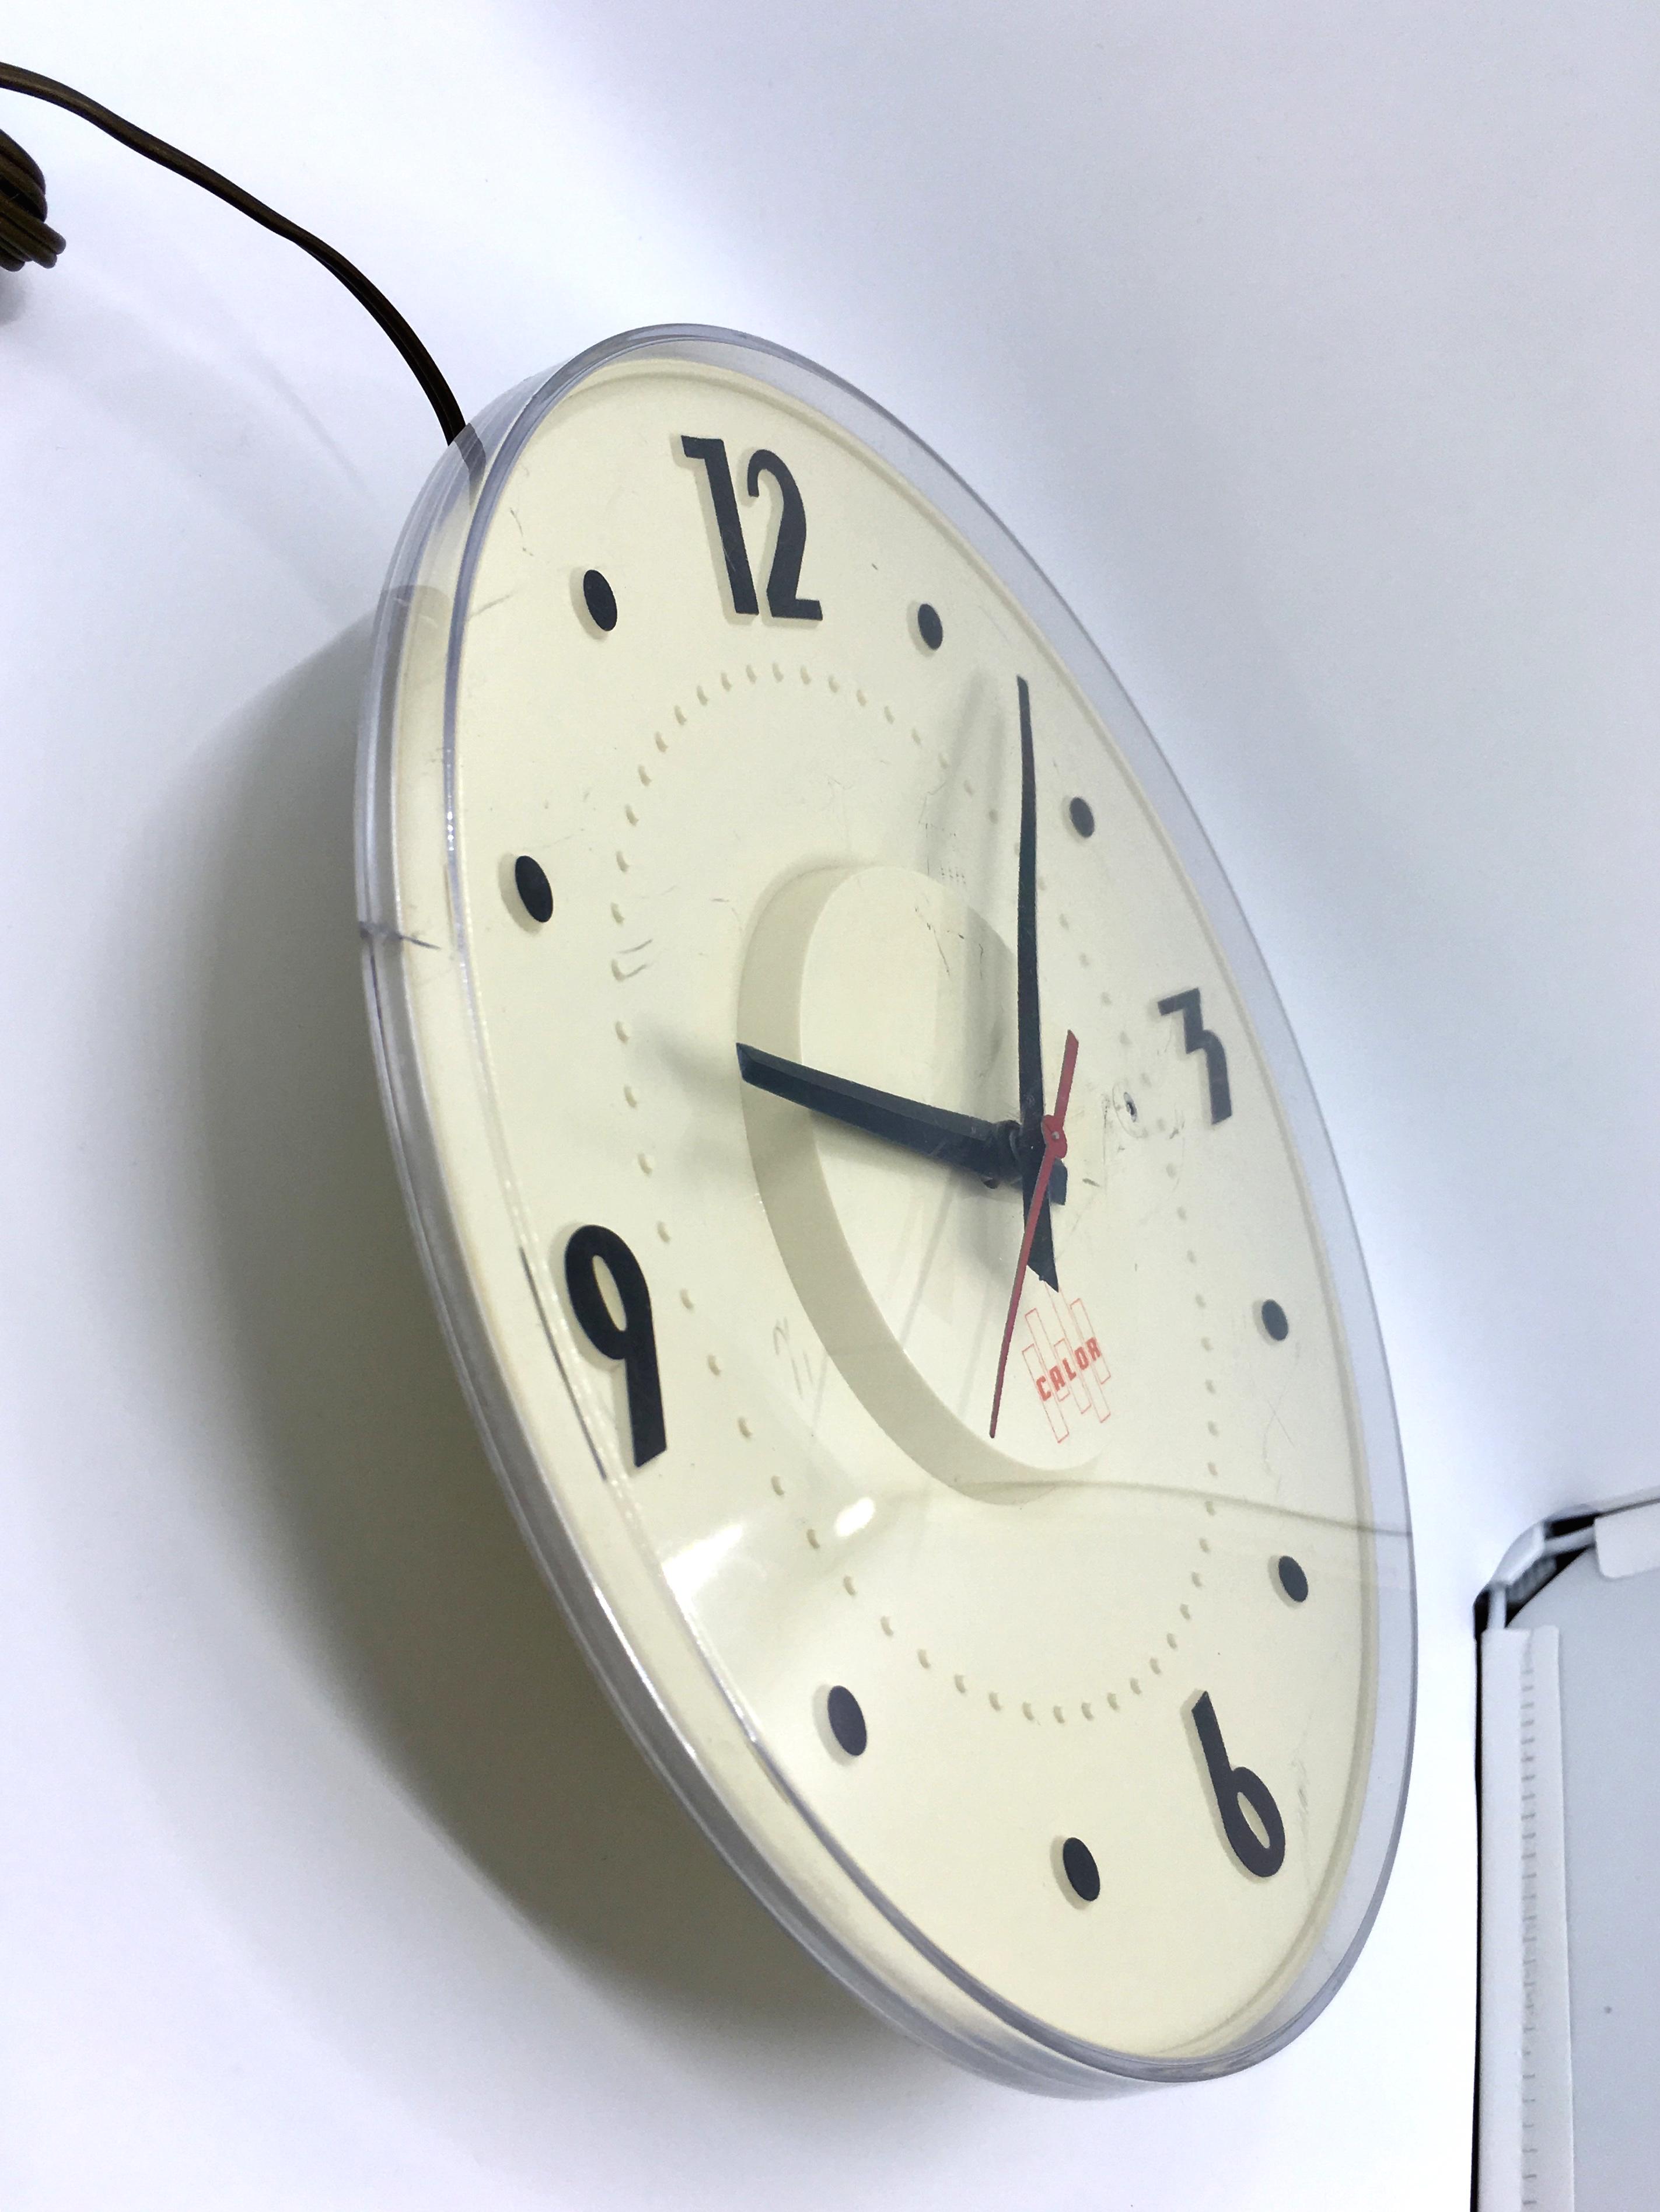 Horloge murale r tro vintage calor brocnshop for Horloge murale retro